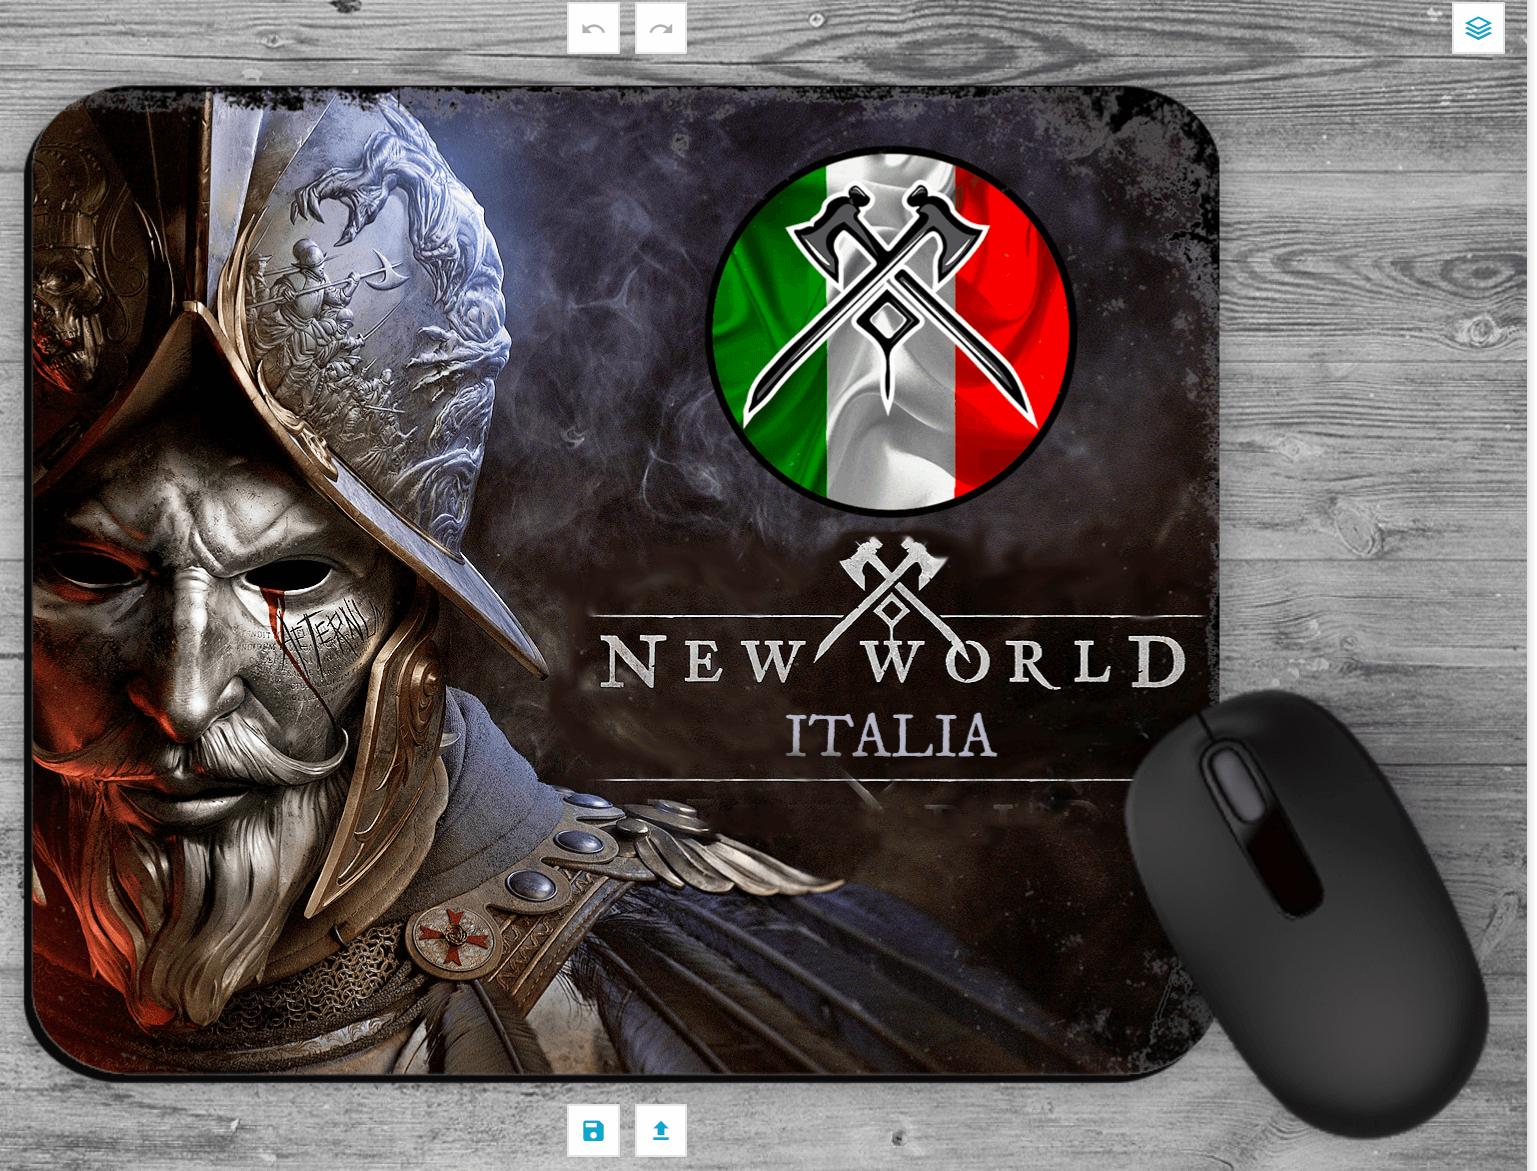 new world mmorpg New World Italia